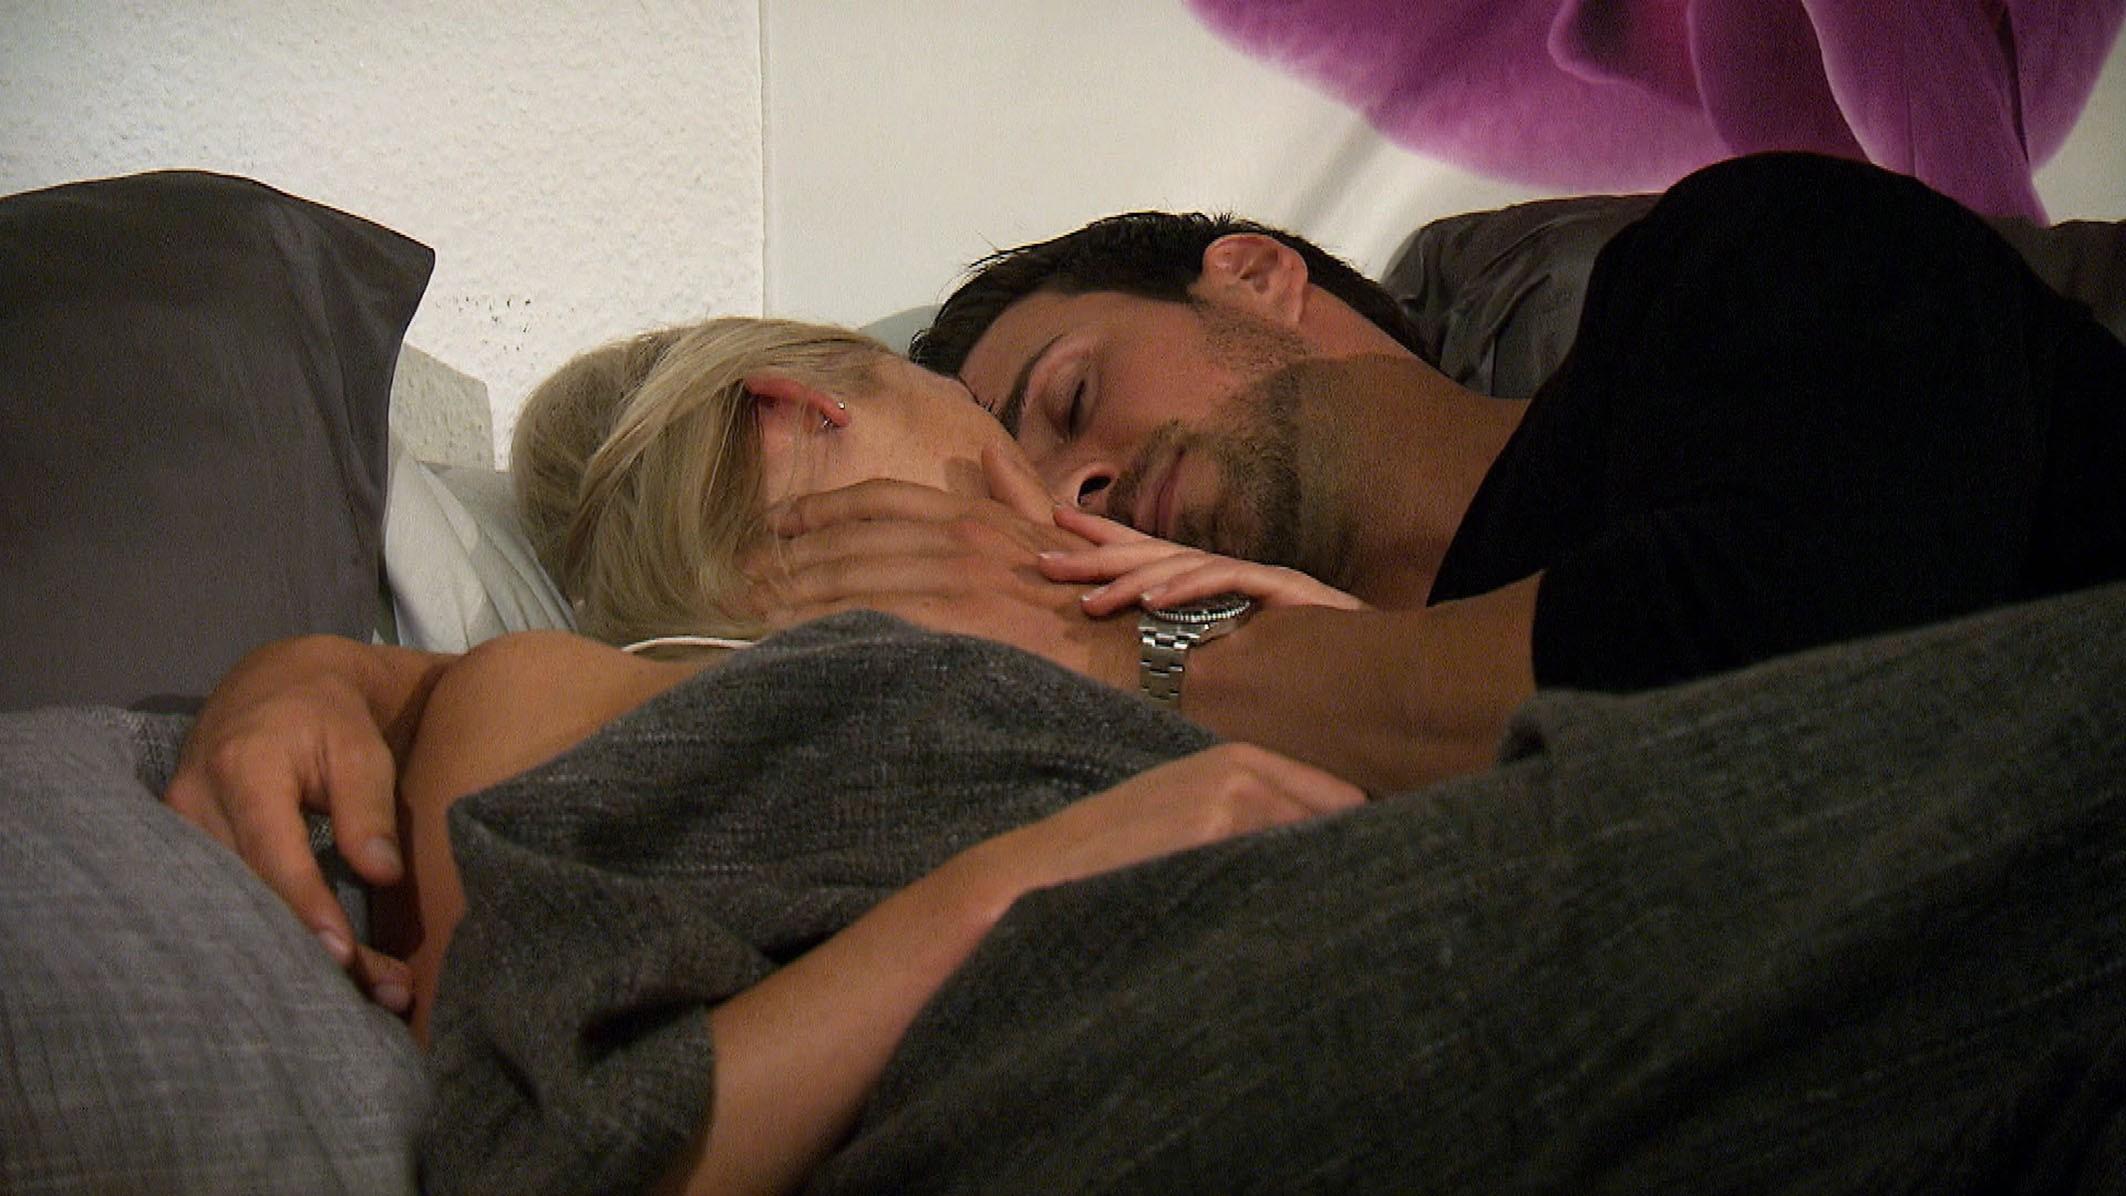 Der Bachelor 2016 Folge 6 - Leonard verbringt die Nacht bei Daniela